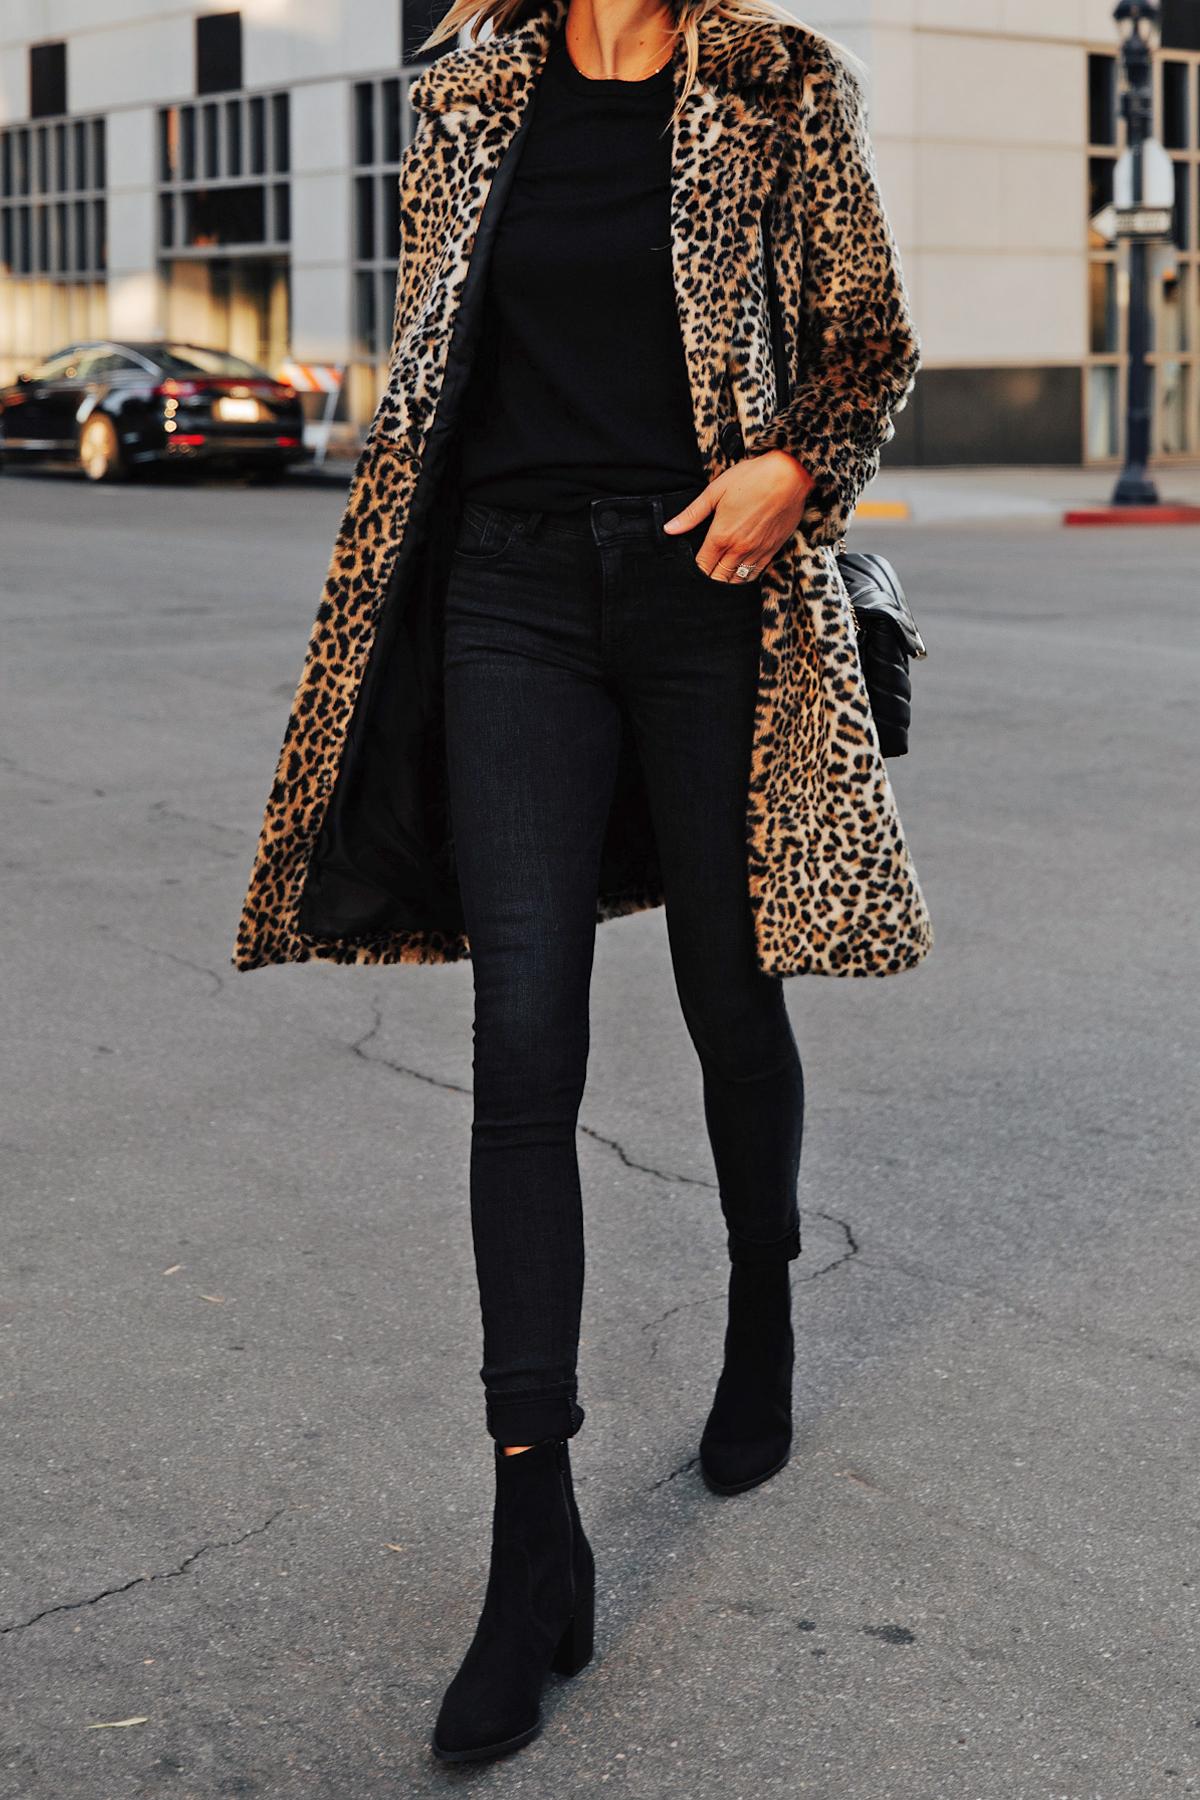 Fashion Jackson Wearing Express Faux Fur Leopard Coat Black Sweater Black Jeans Black Booties Christmas Outfit Idea